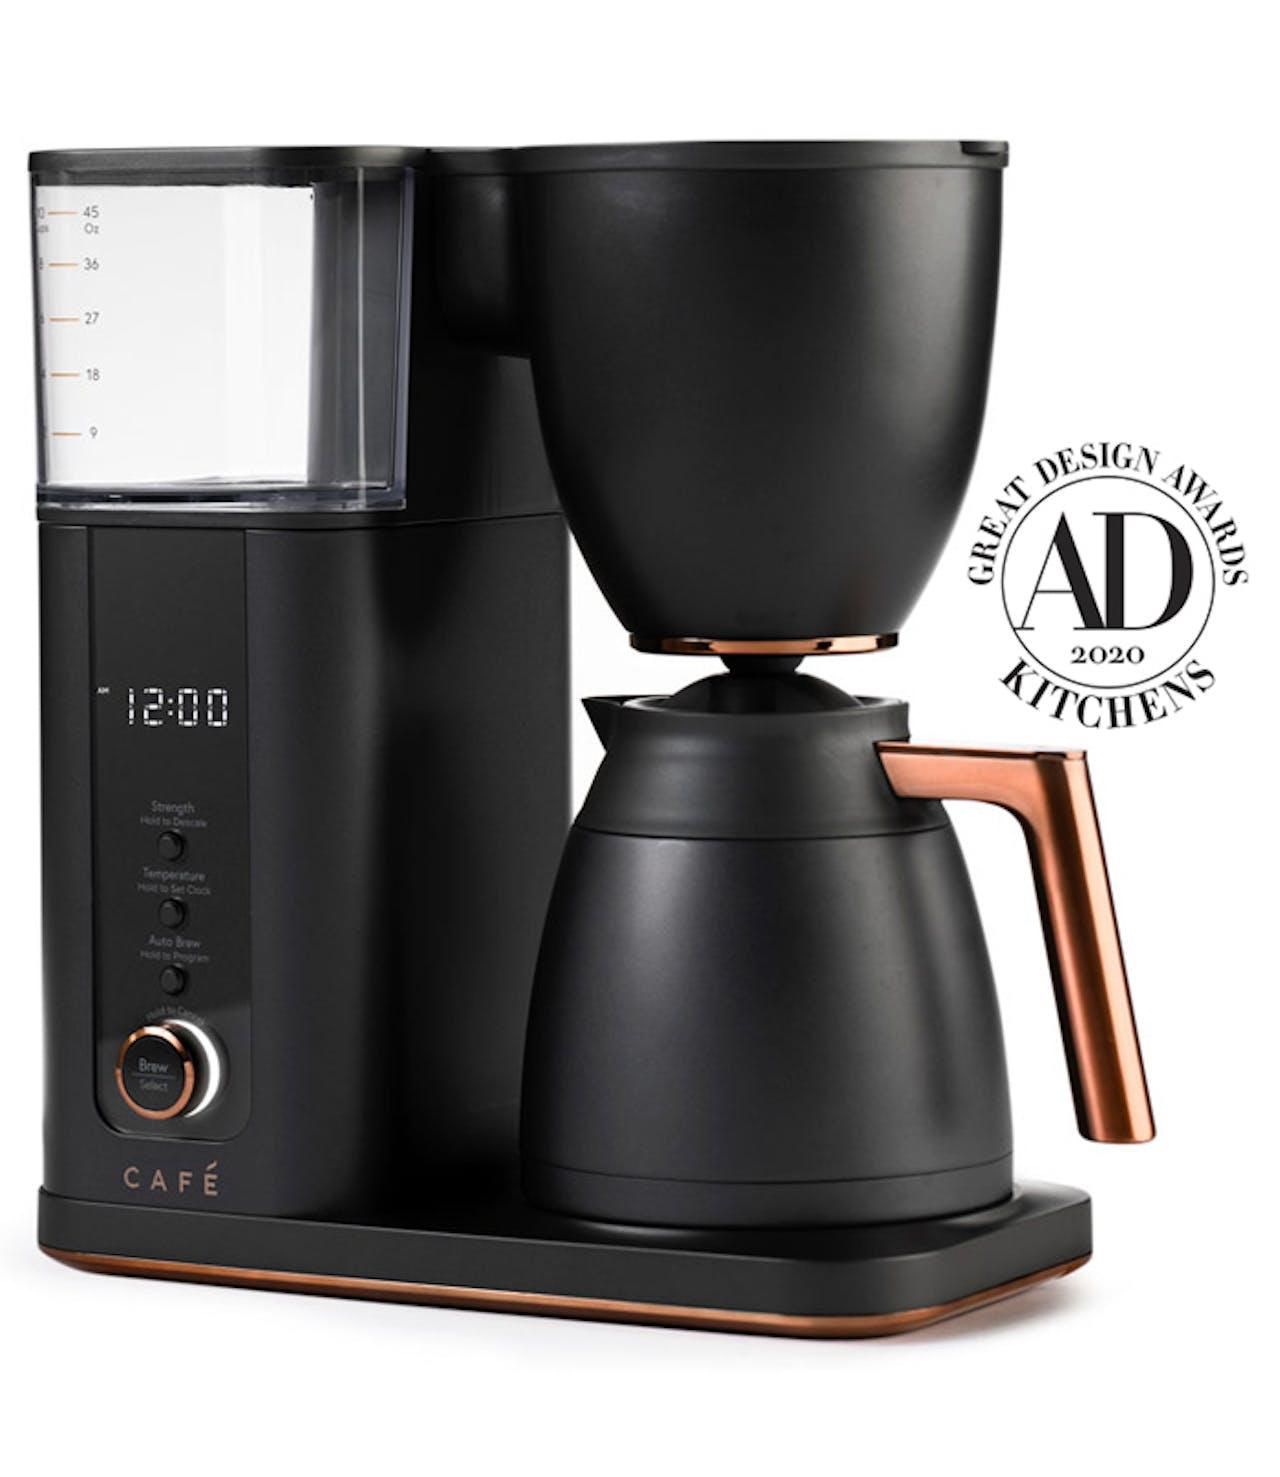 cafe matte black coffee maker winner of Architectural Digest Great Design Award 2020